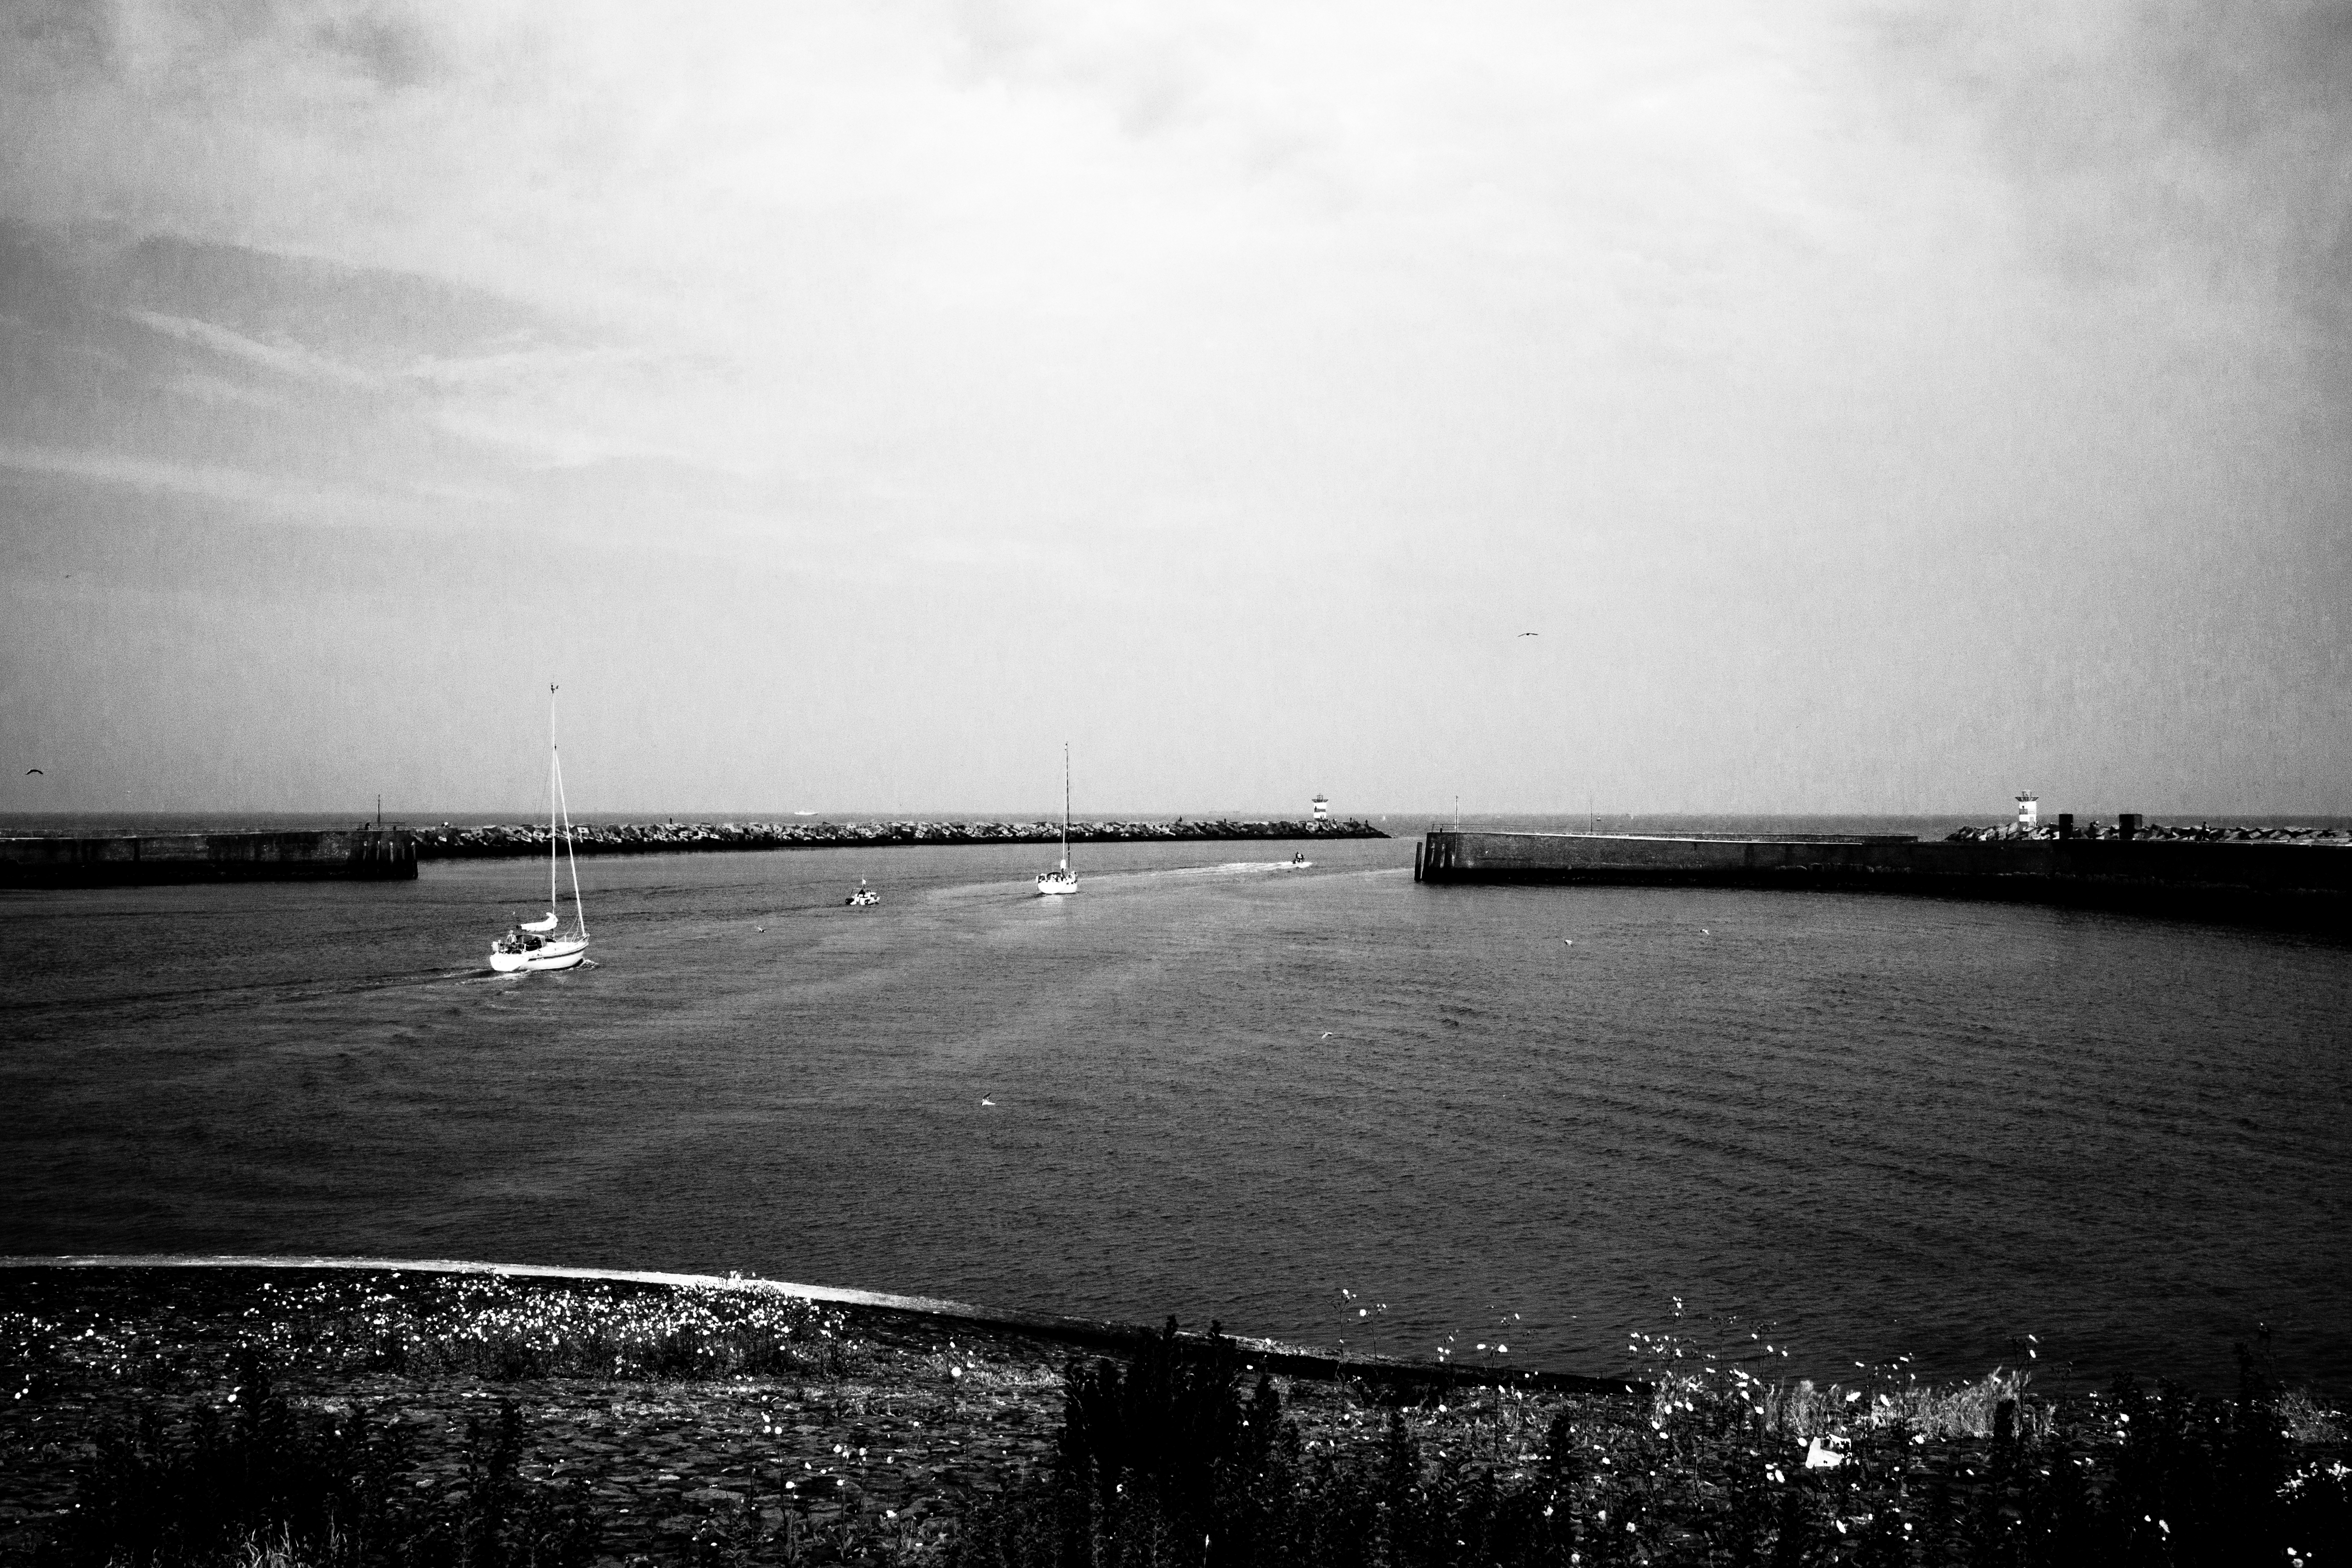 Scheveningen - port de la haye - taking the sea photo